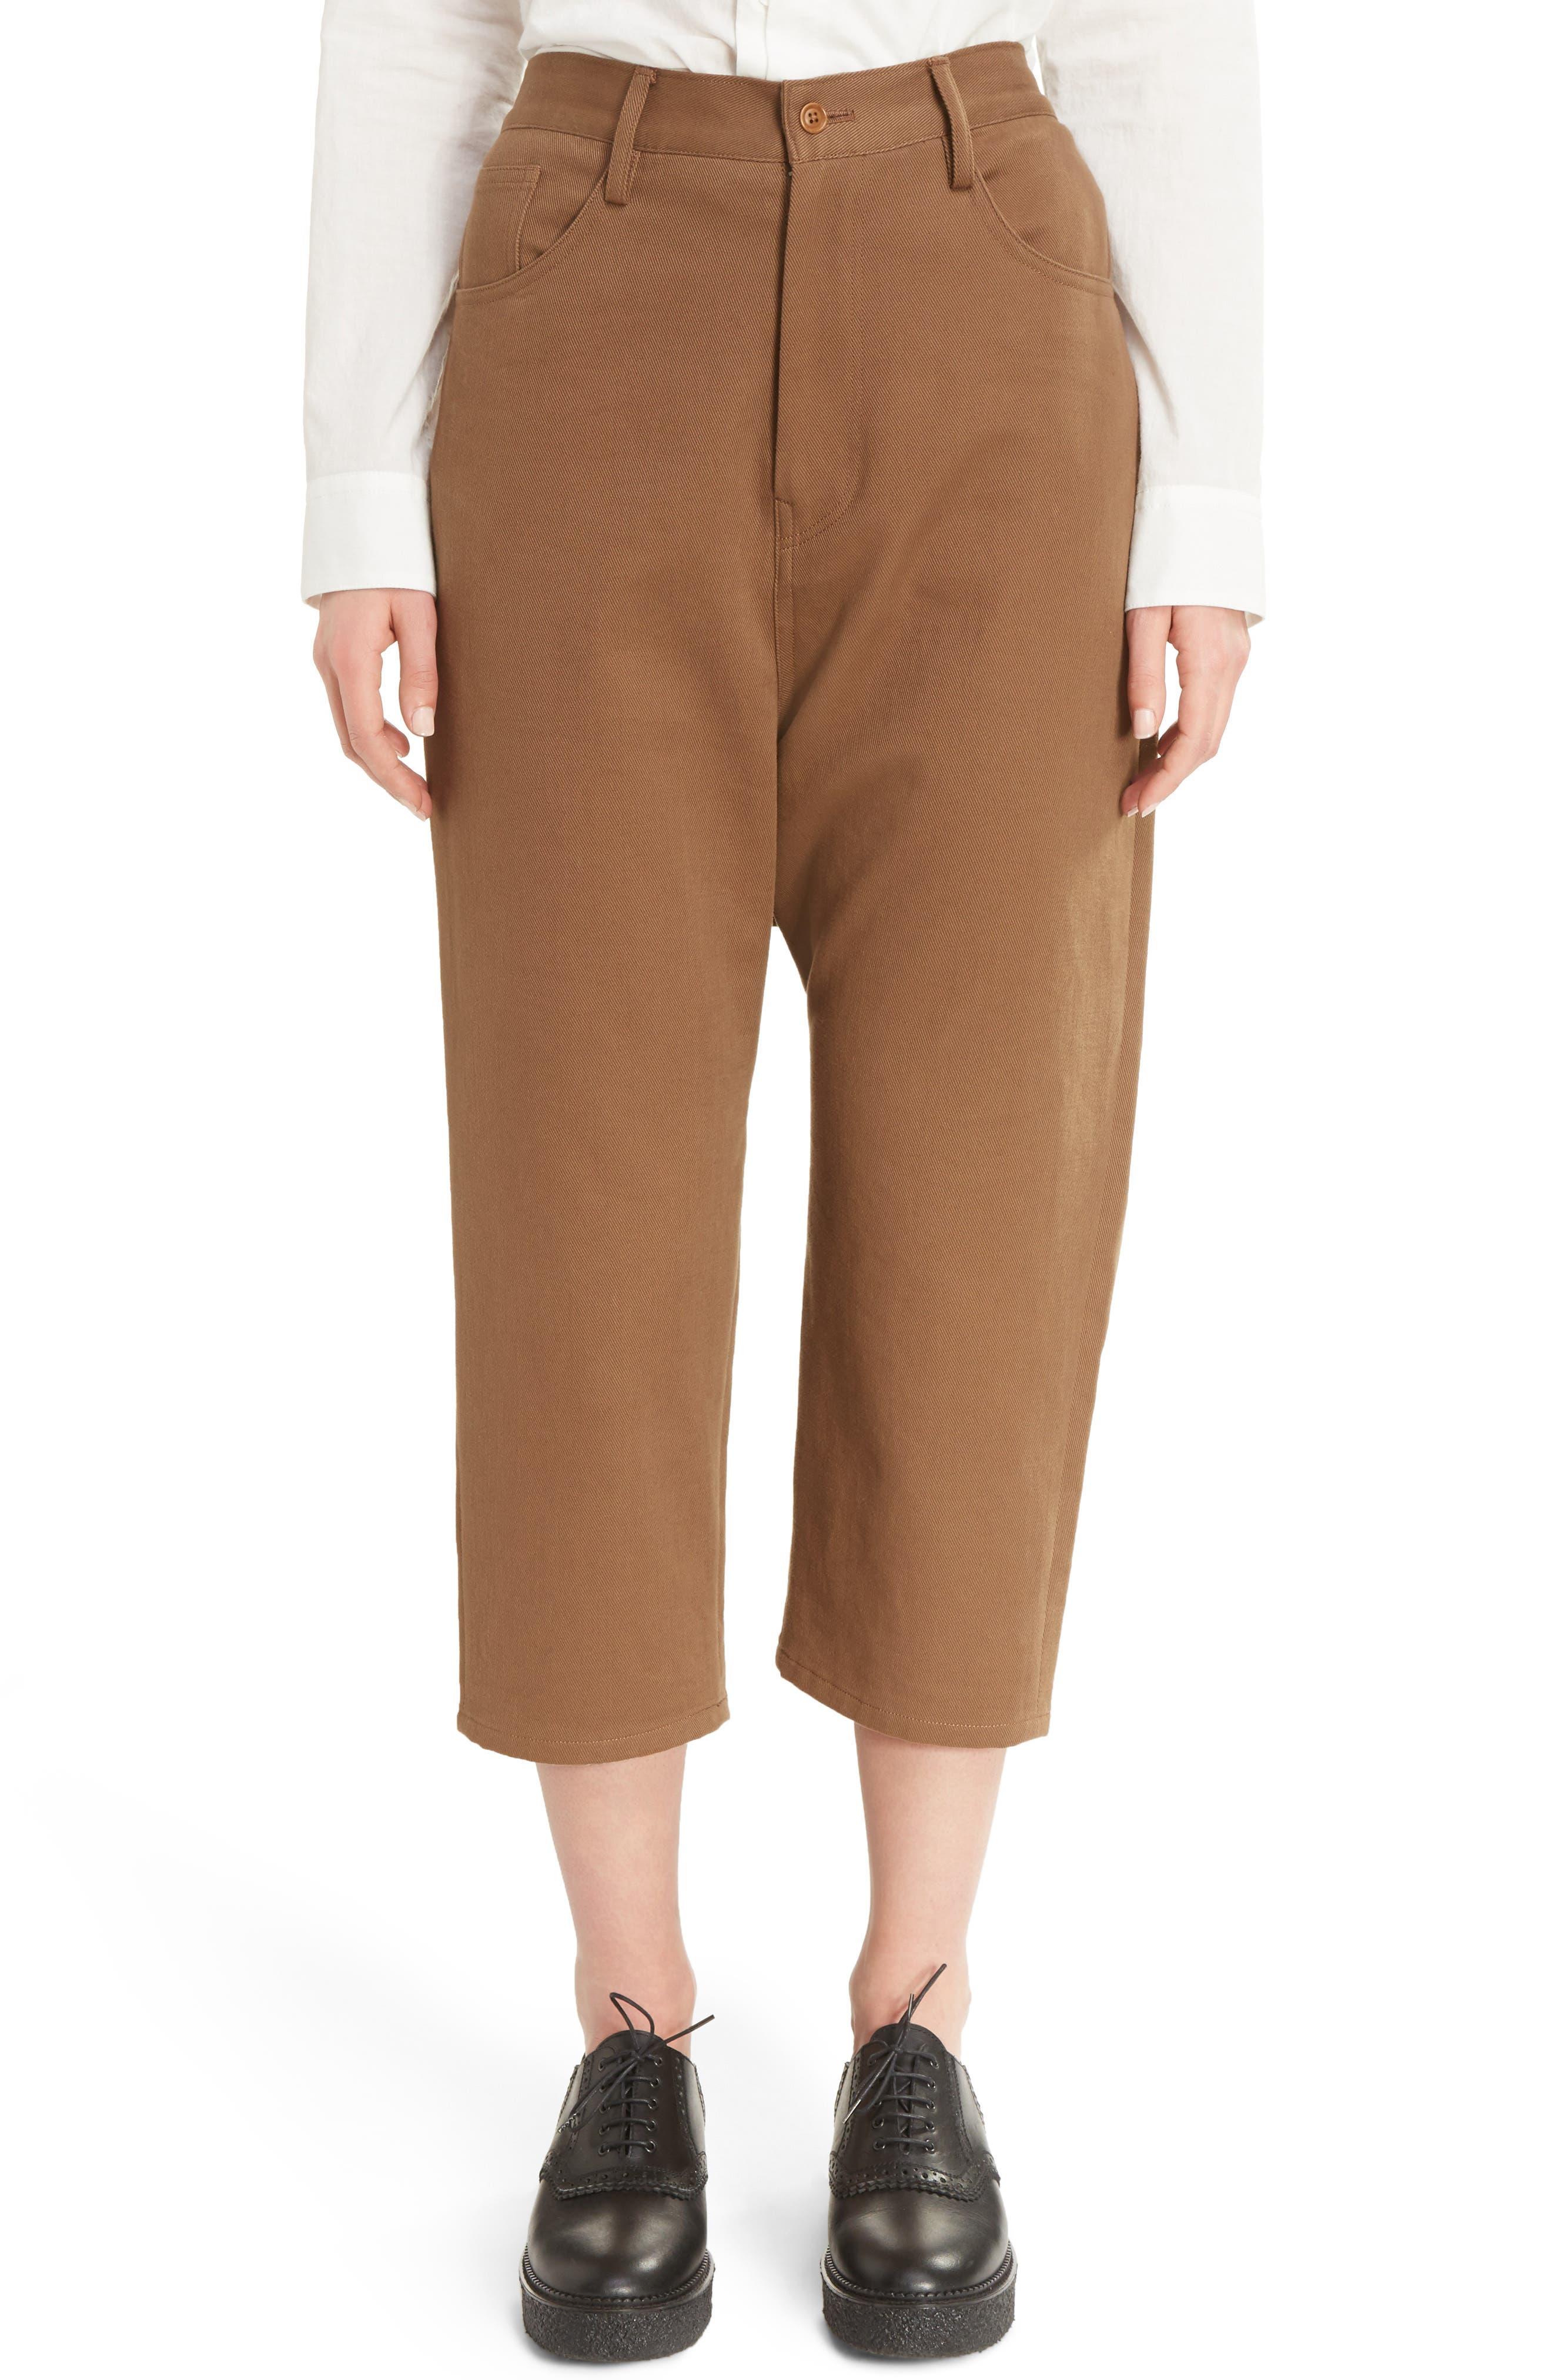 Y's by Yohji Yamamoto U-Drop Crotch Pants